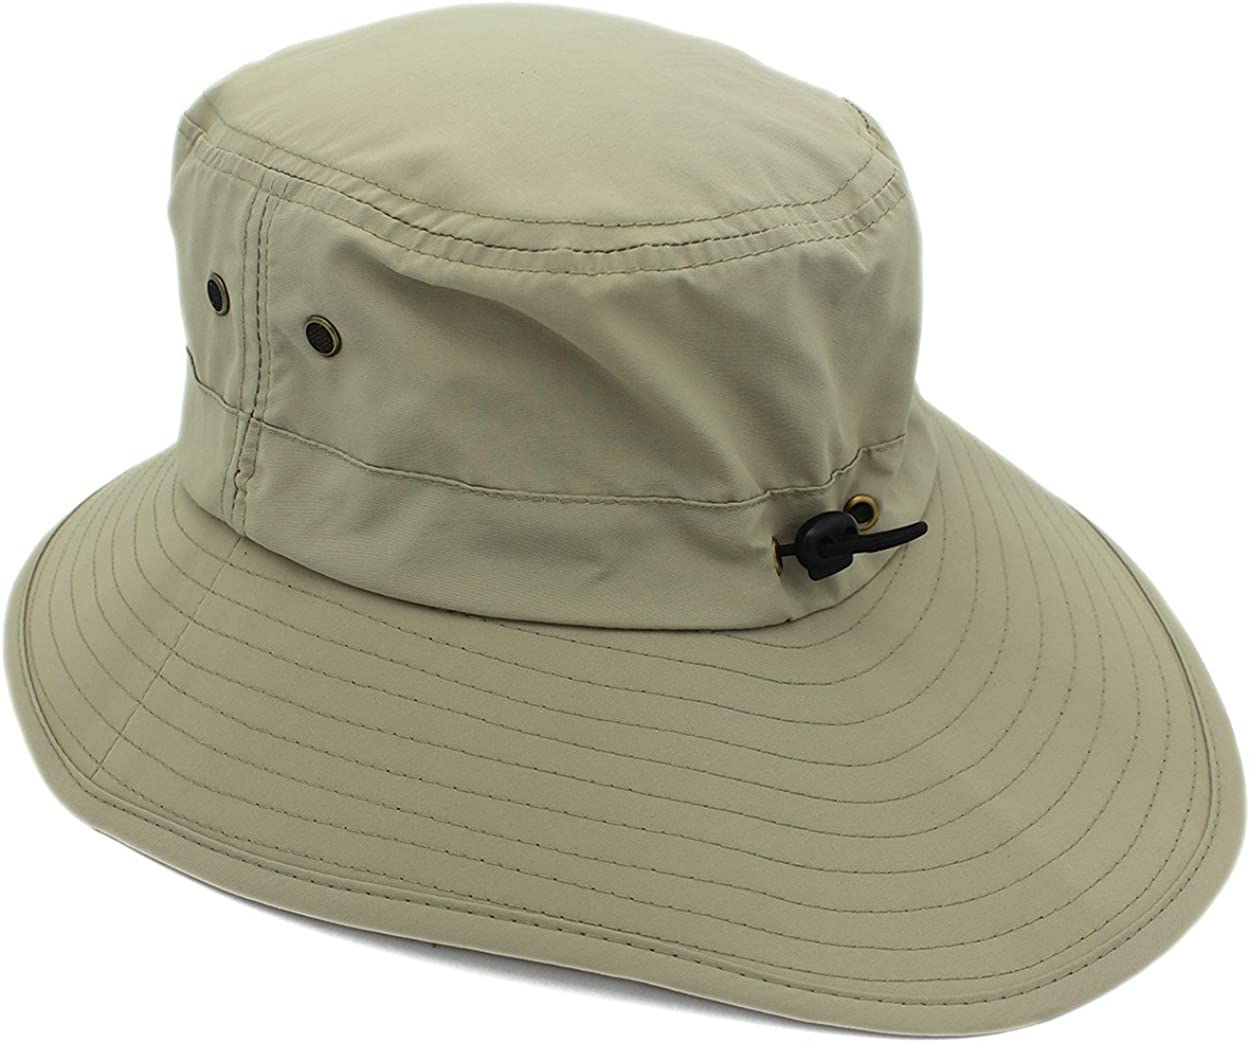 Magracy Unisex Ladies UPF 50 Sun Hat Summer Wide Brim Bucket Hat for Womens Safari Hats